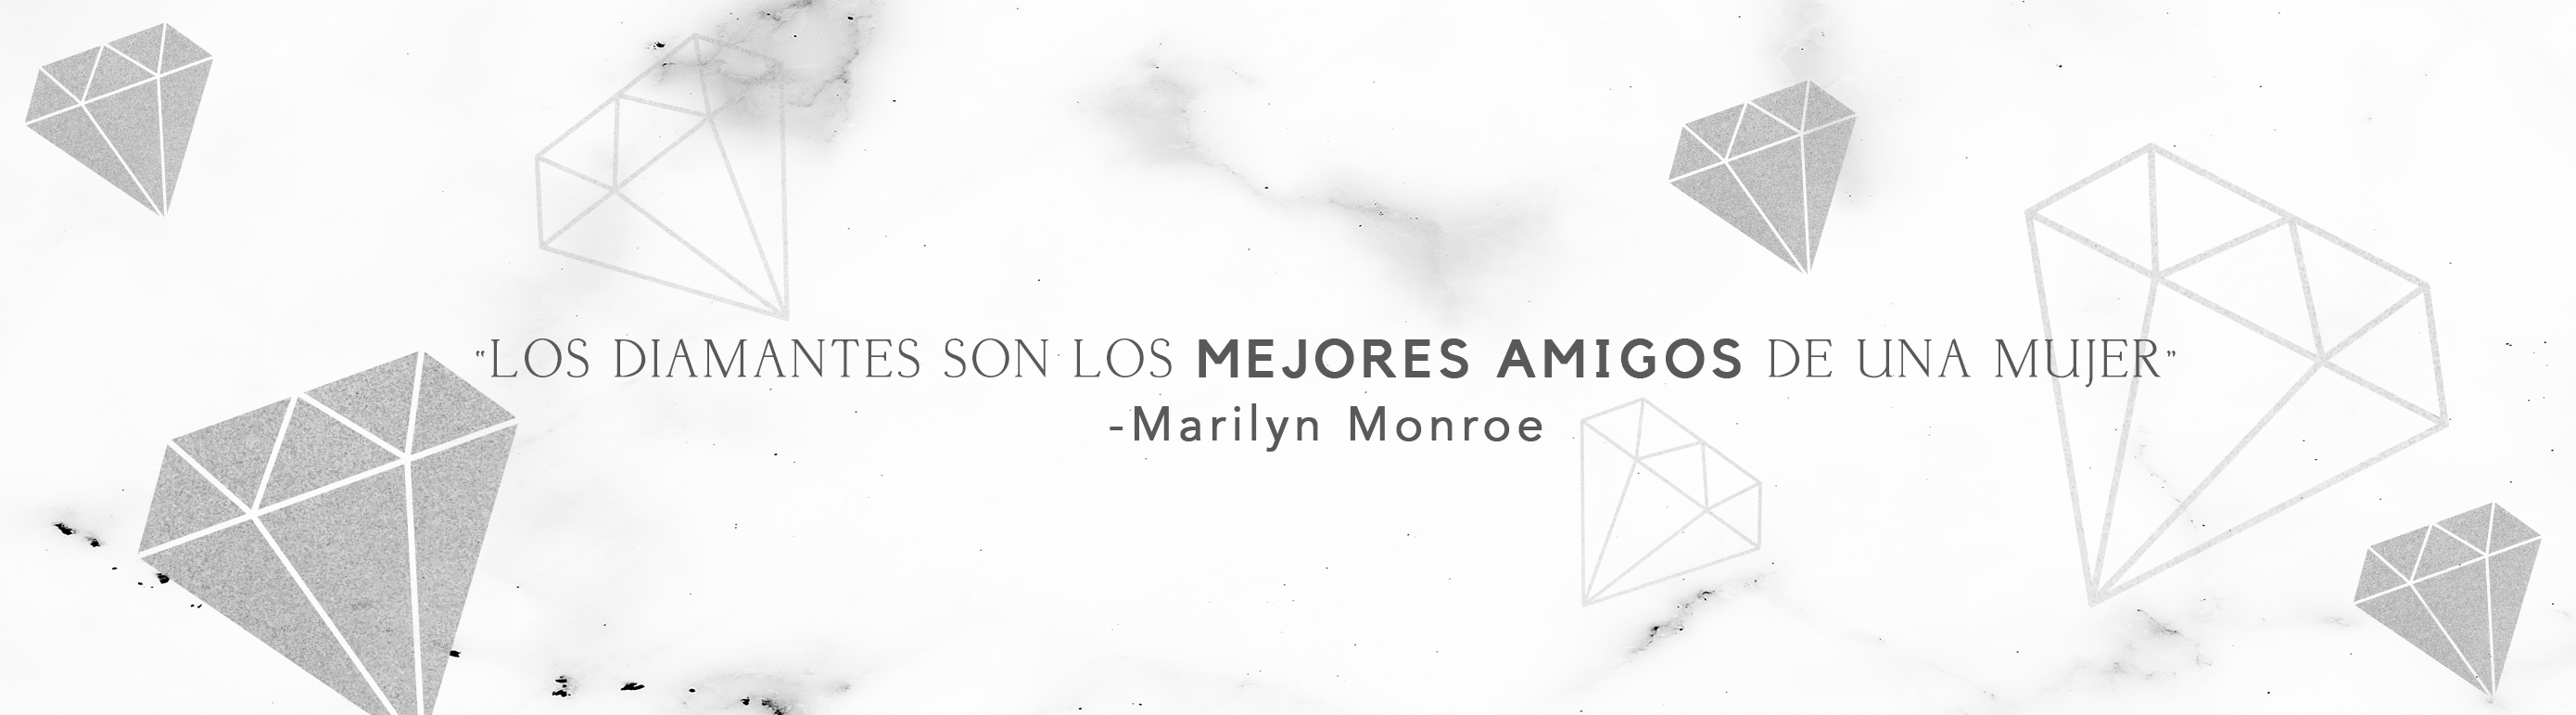 miguett_diamond